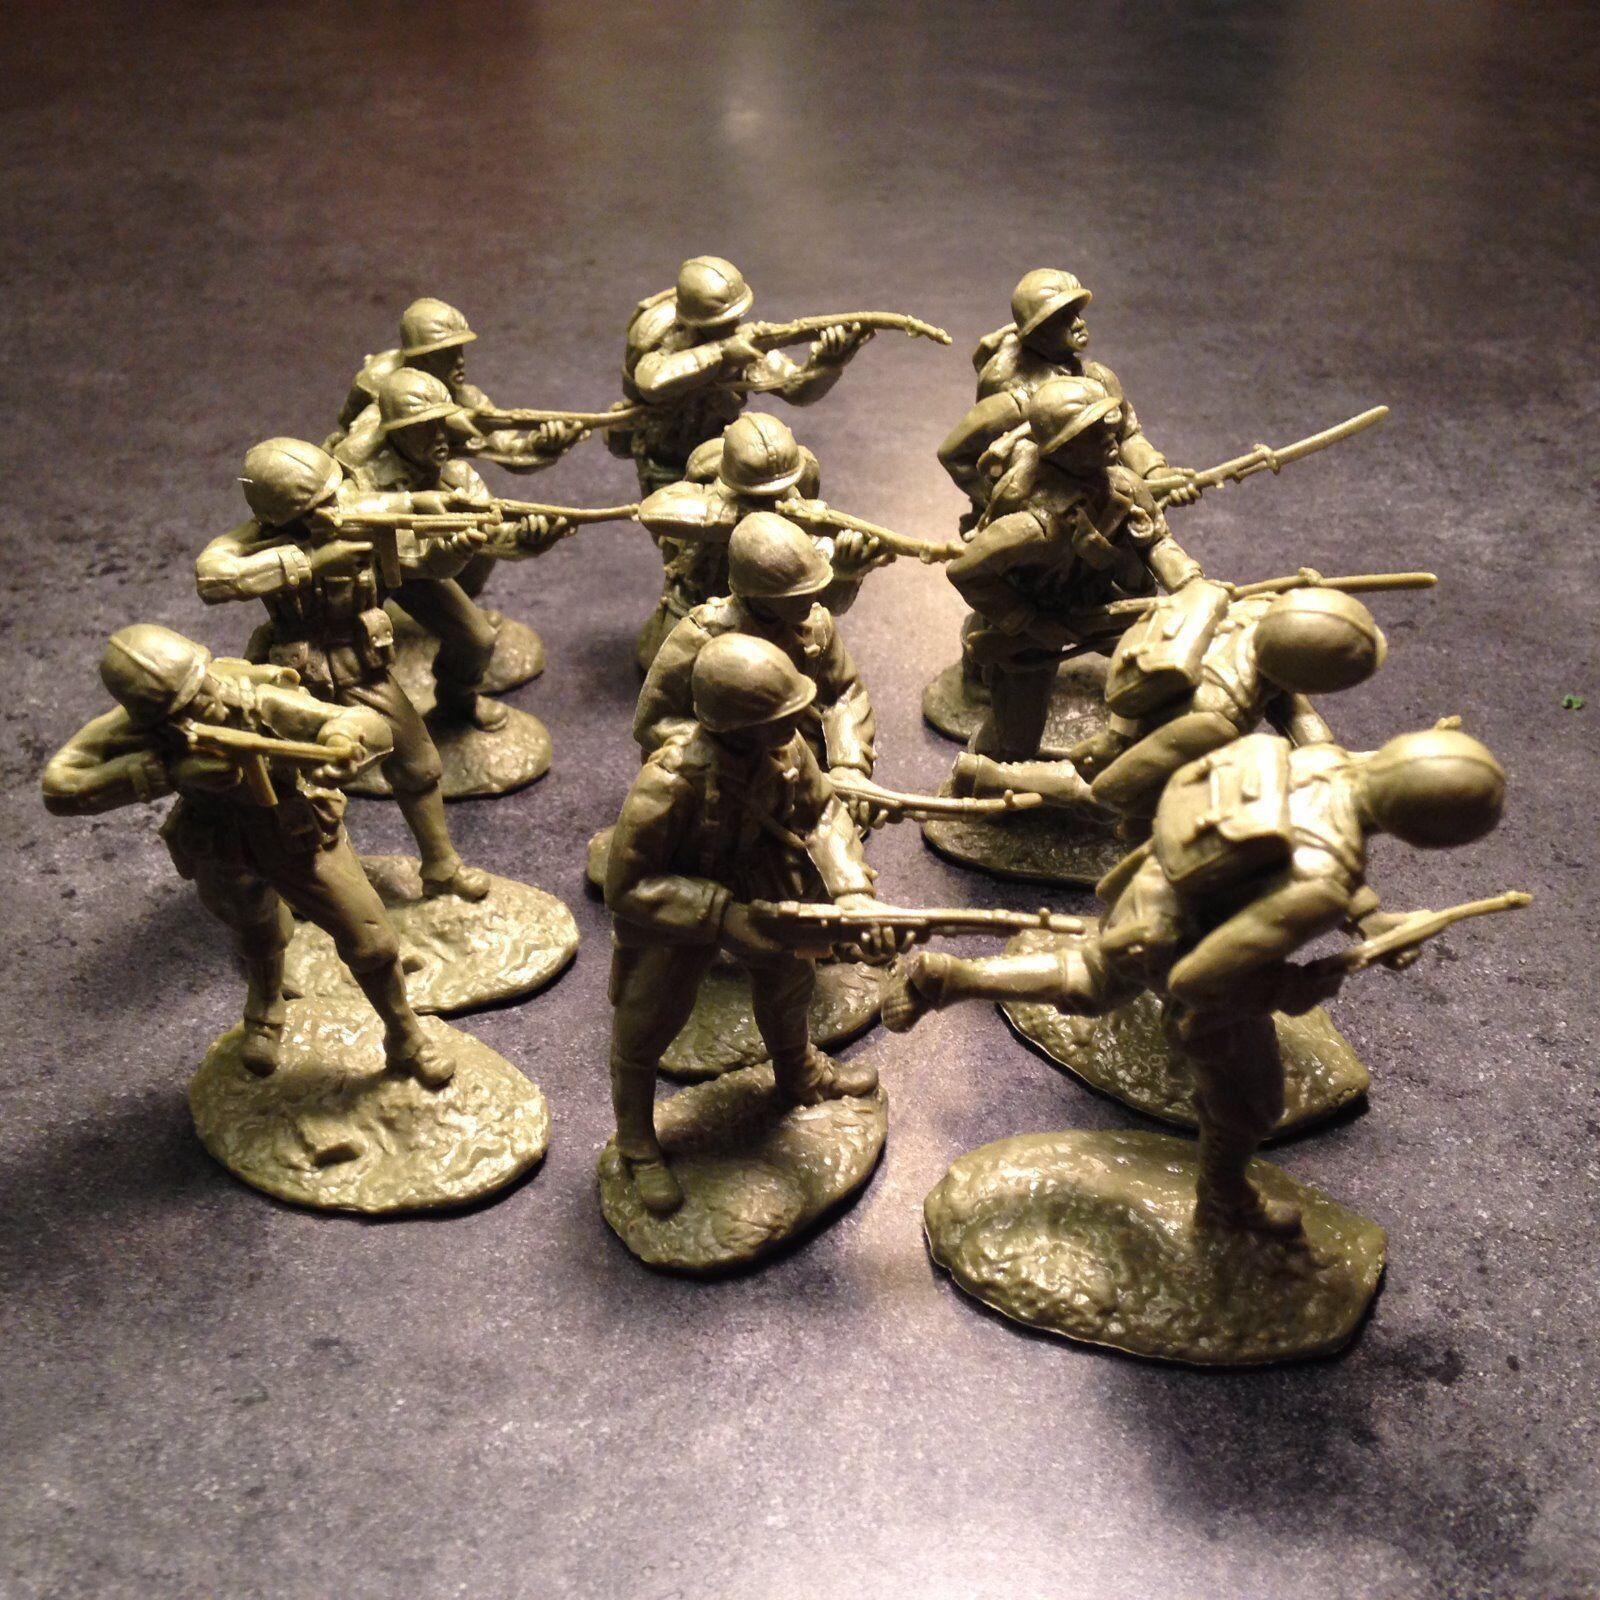 Conte TSSD 1//32 scale plastic figure WW2 US marines OD green Austin Miniatures